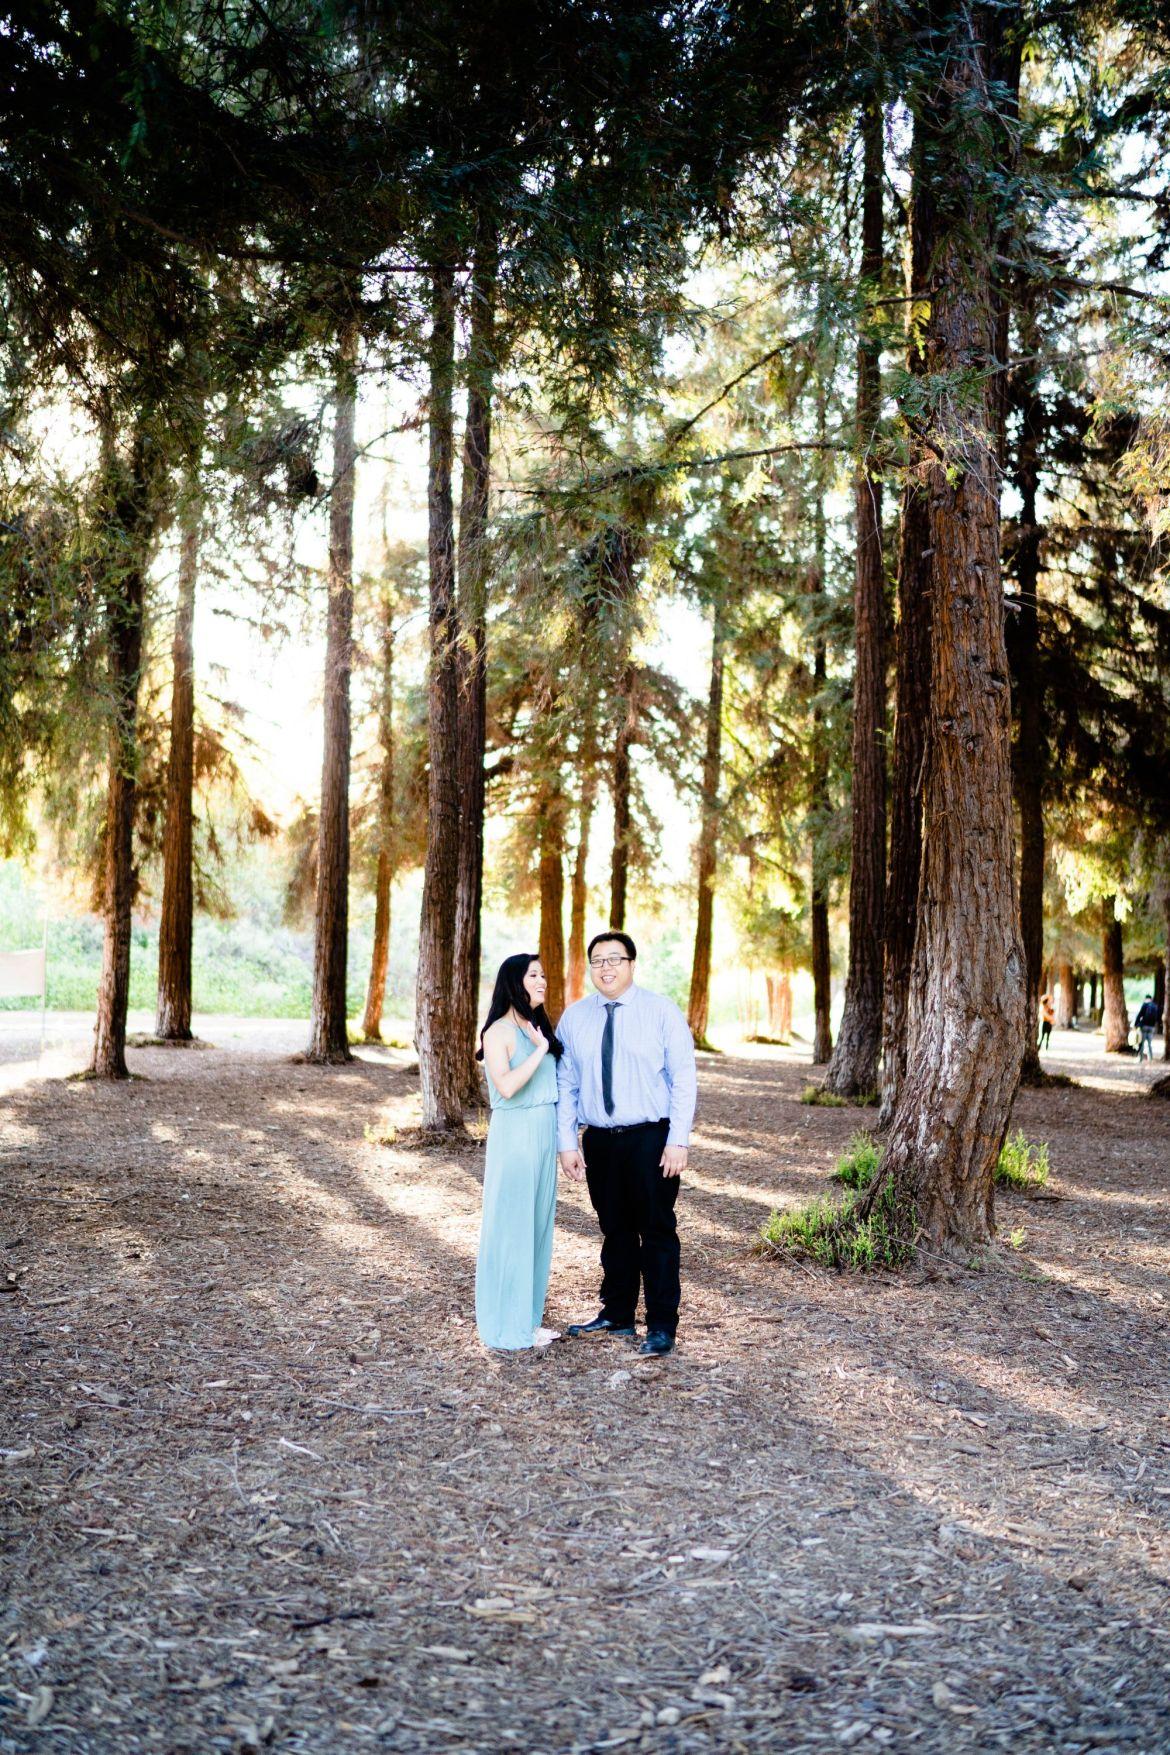 Rowland Heights Wedding Photographer 7